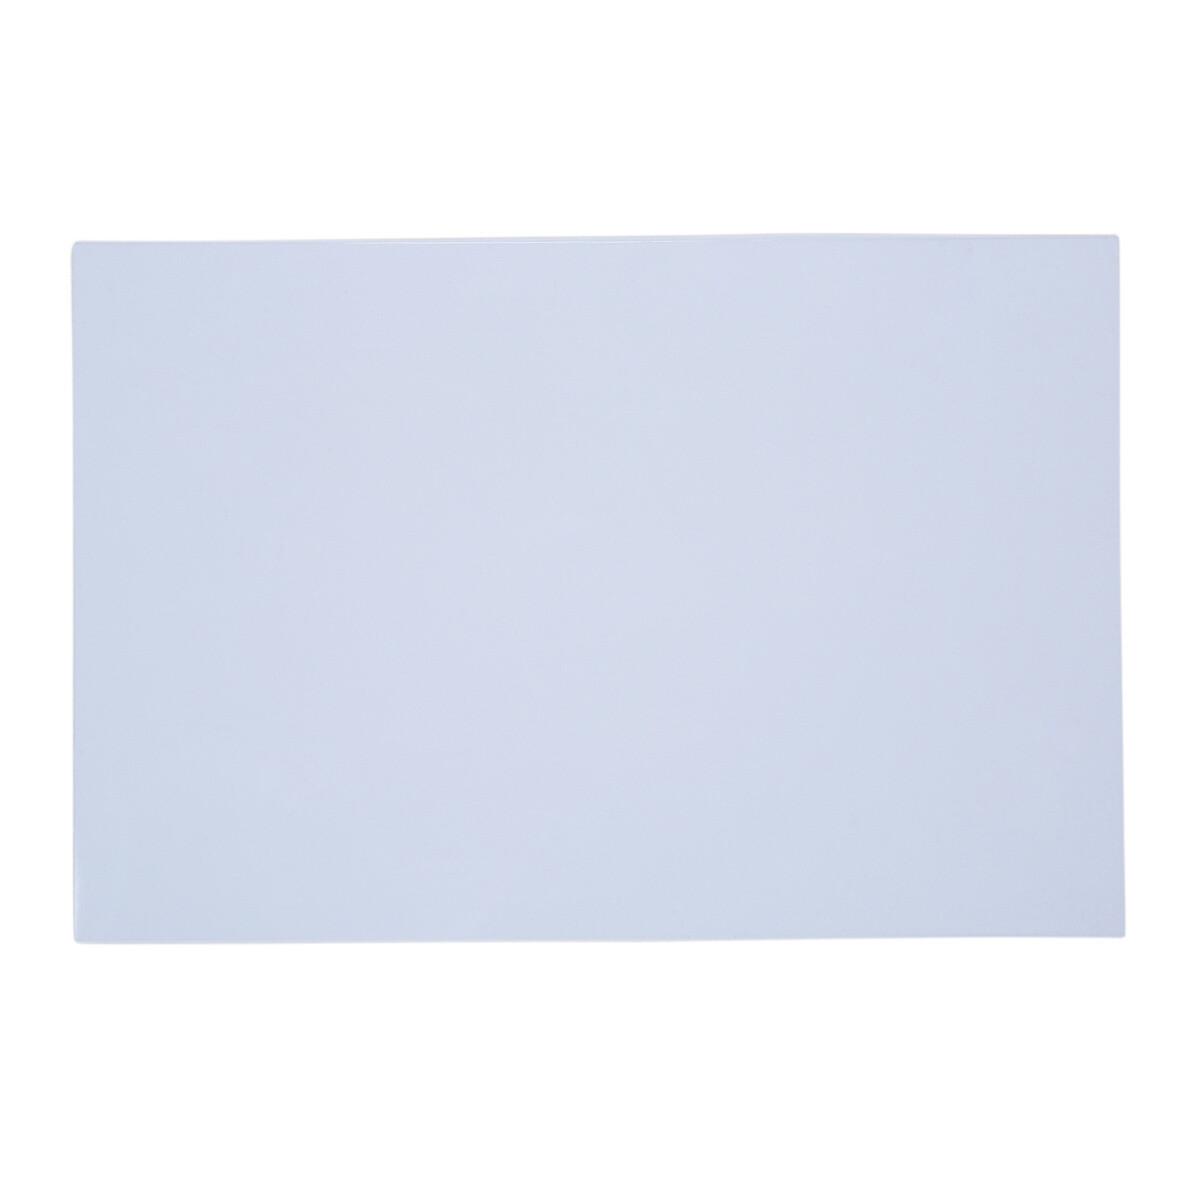 "Brio Pickguard Blanks 12"" x 17"" 1 Ply White"